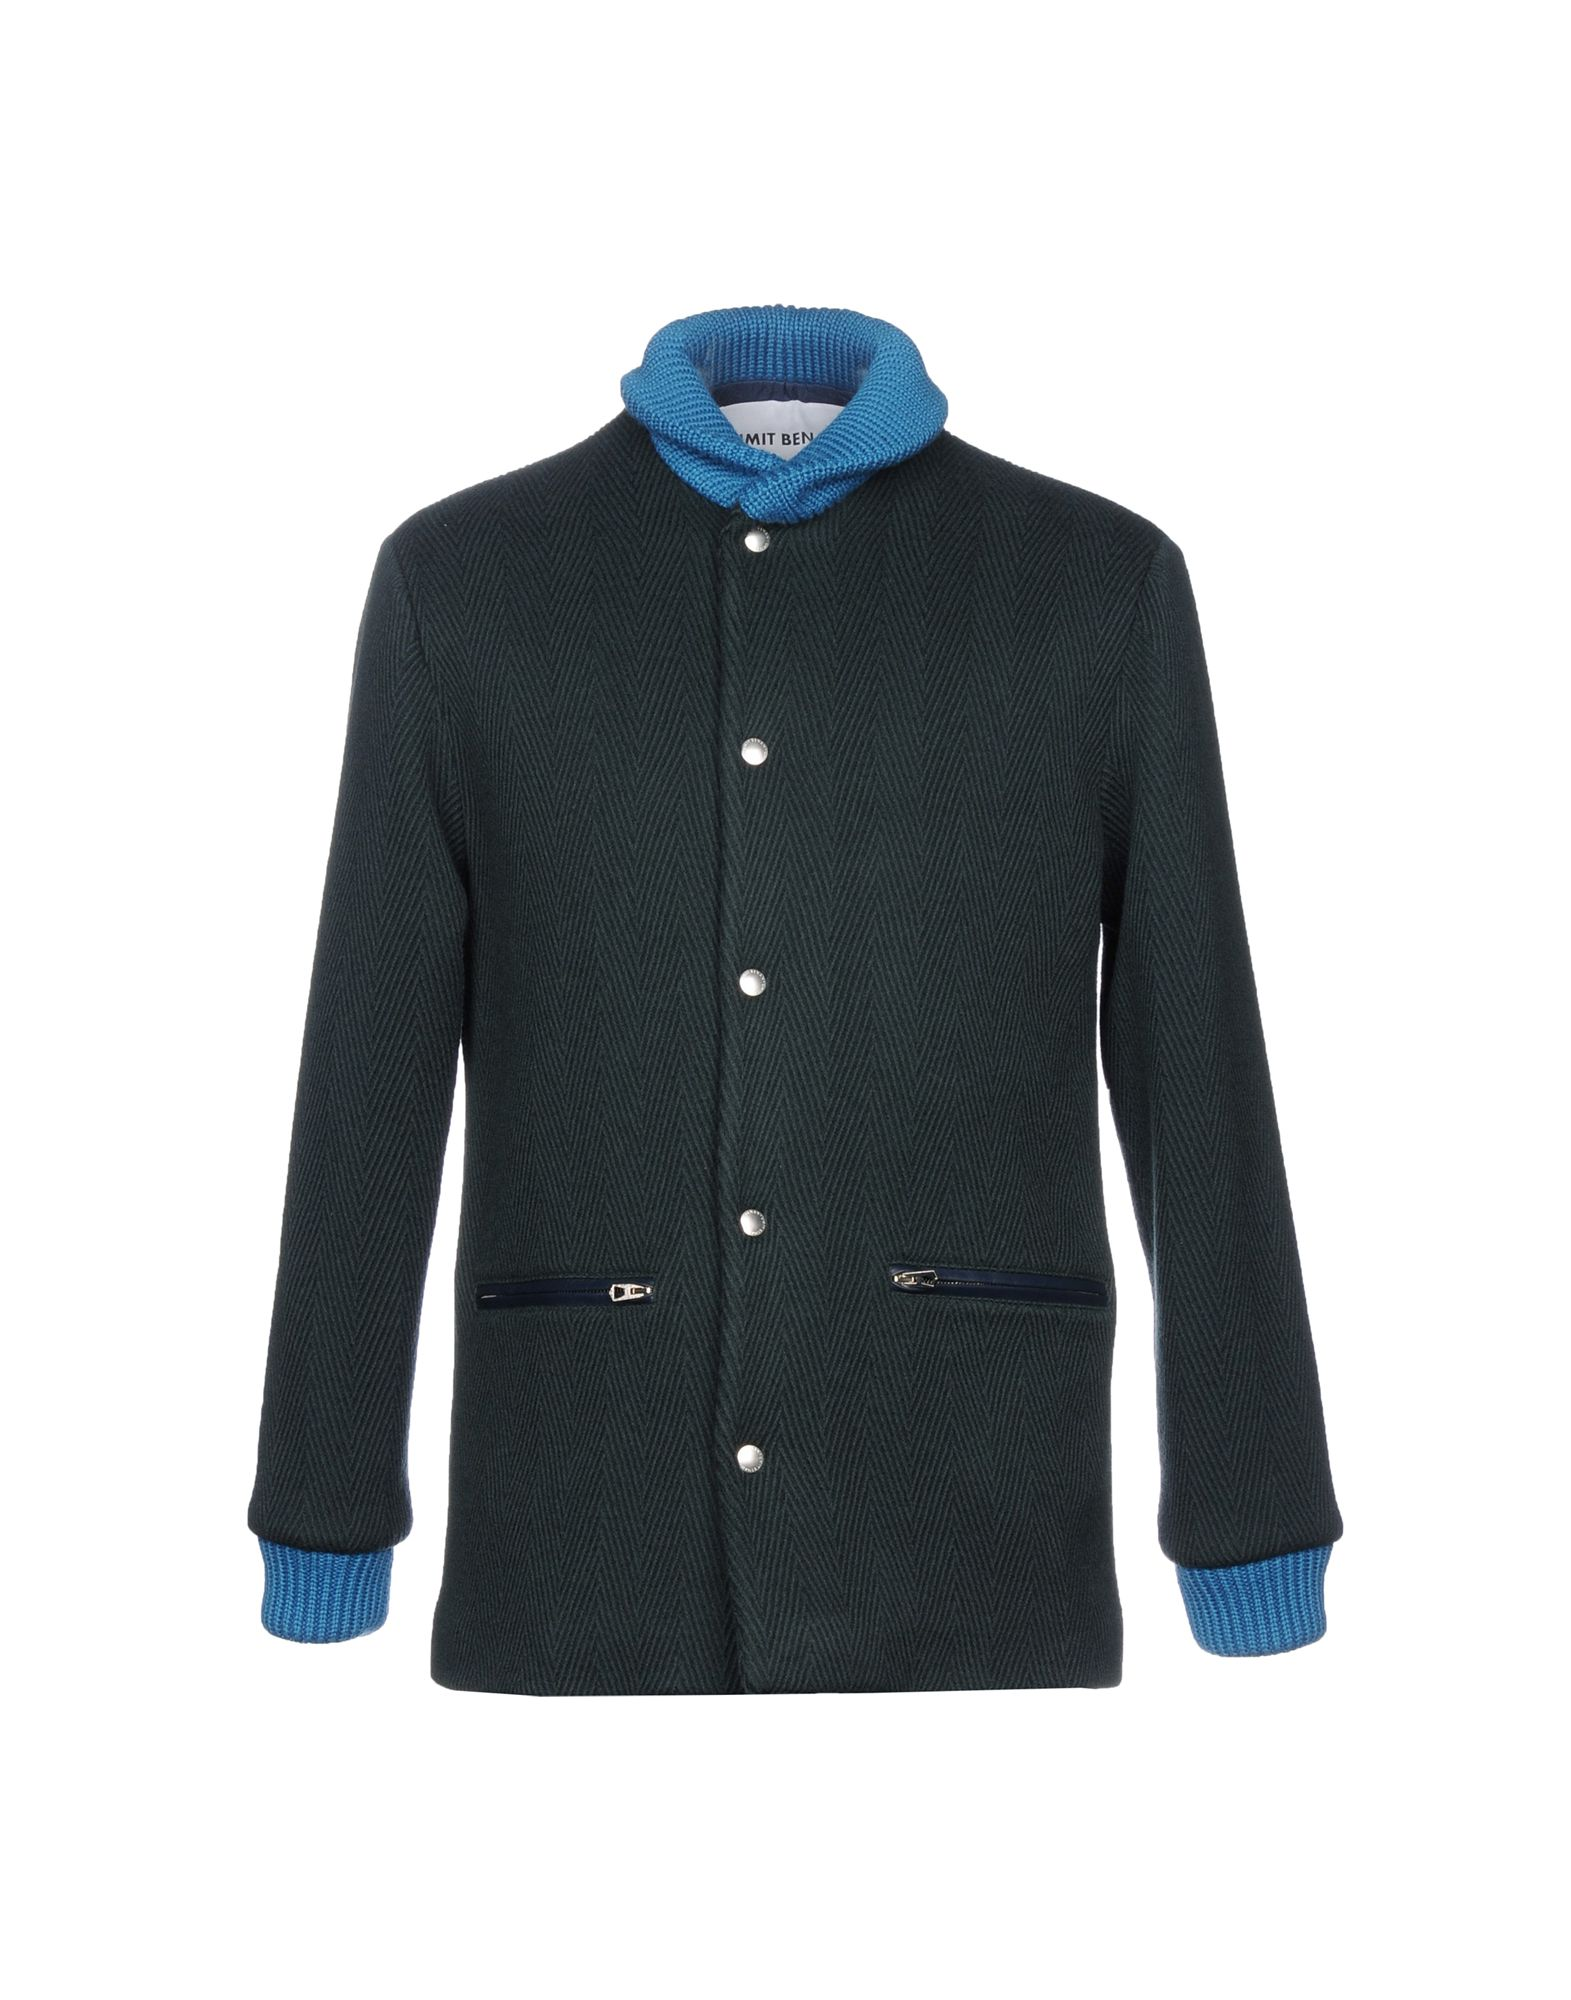 UMIT BENAN Jacket in Dark Green